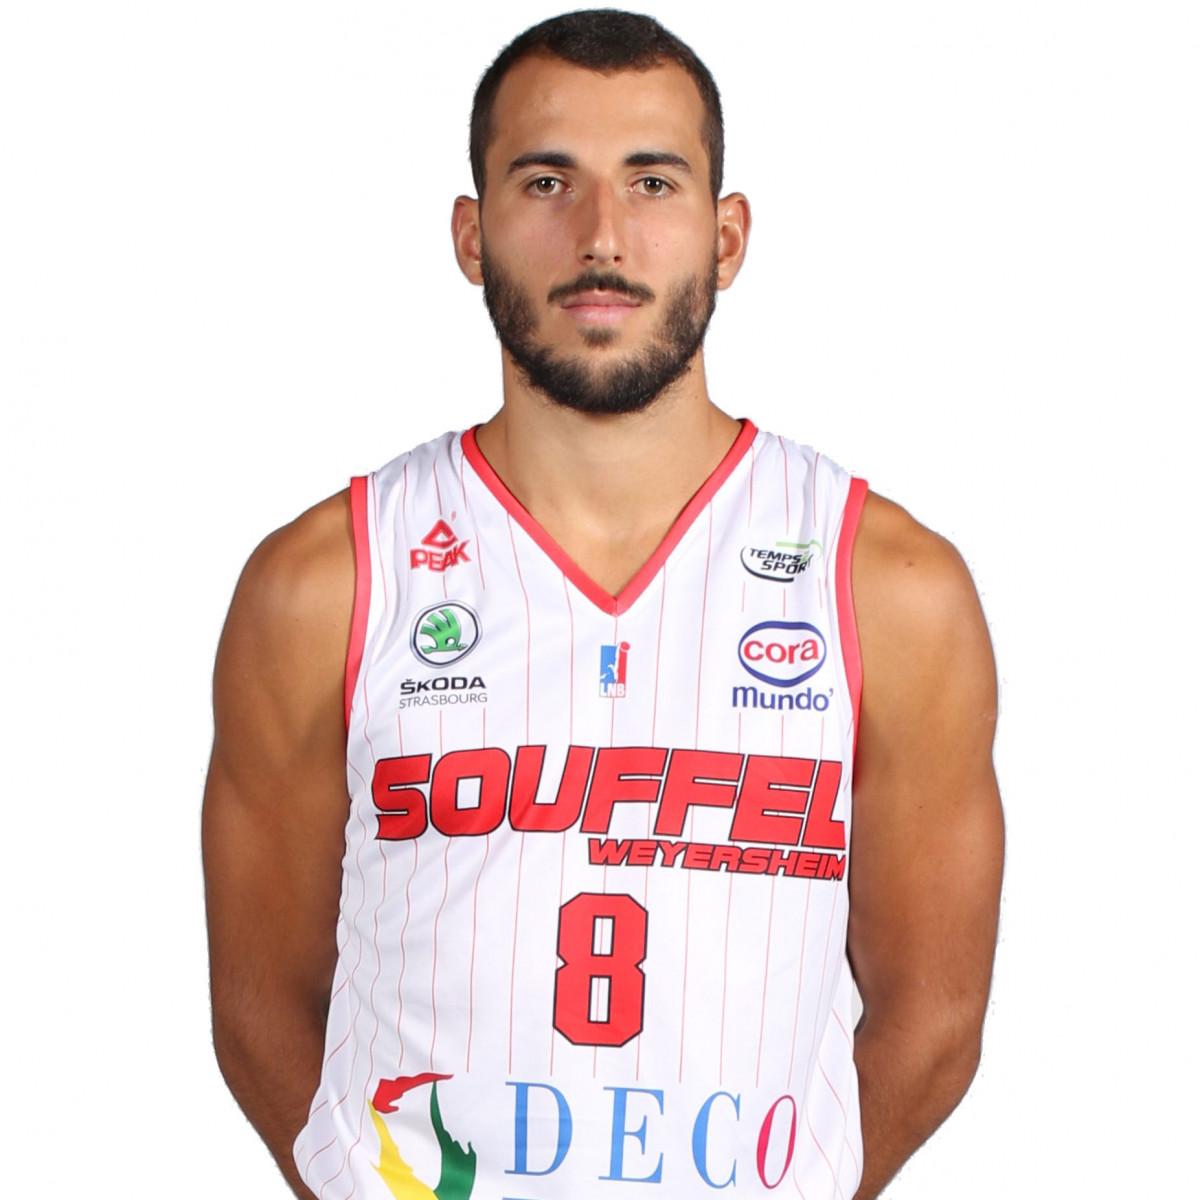 Photo of Antony Labanca, 2019-2020 season